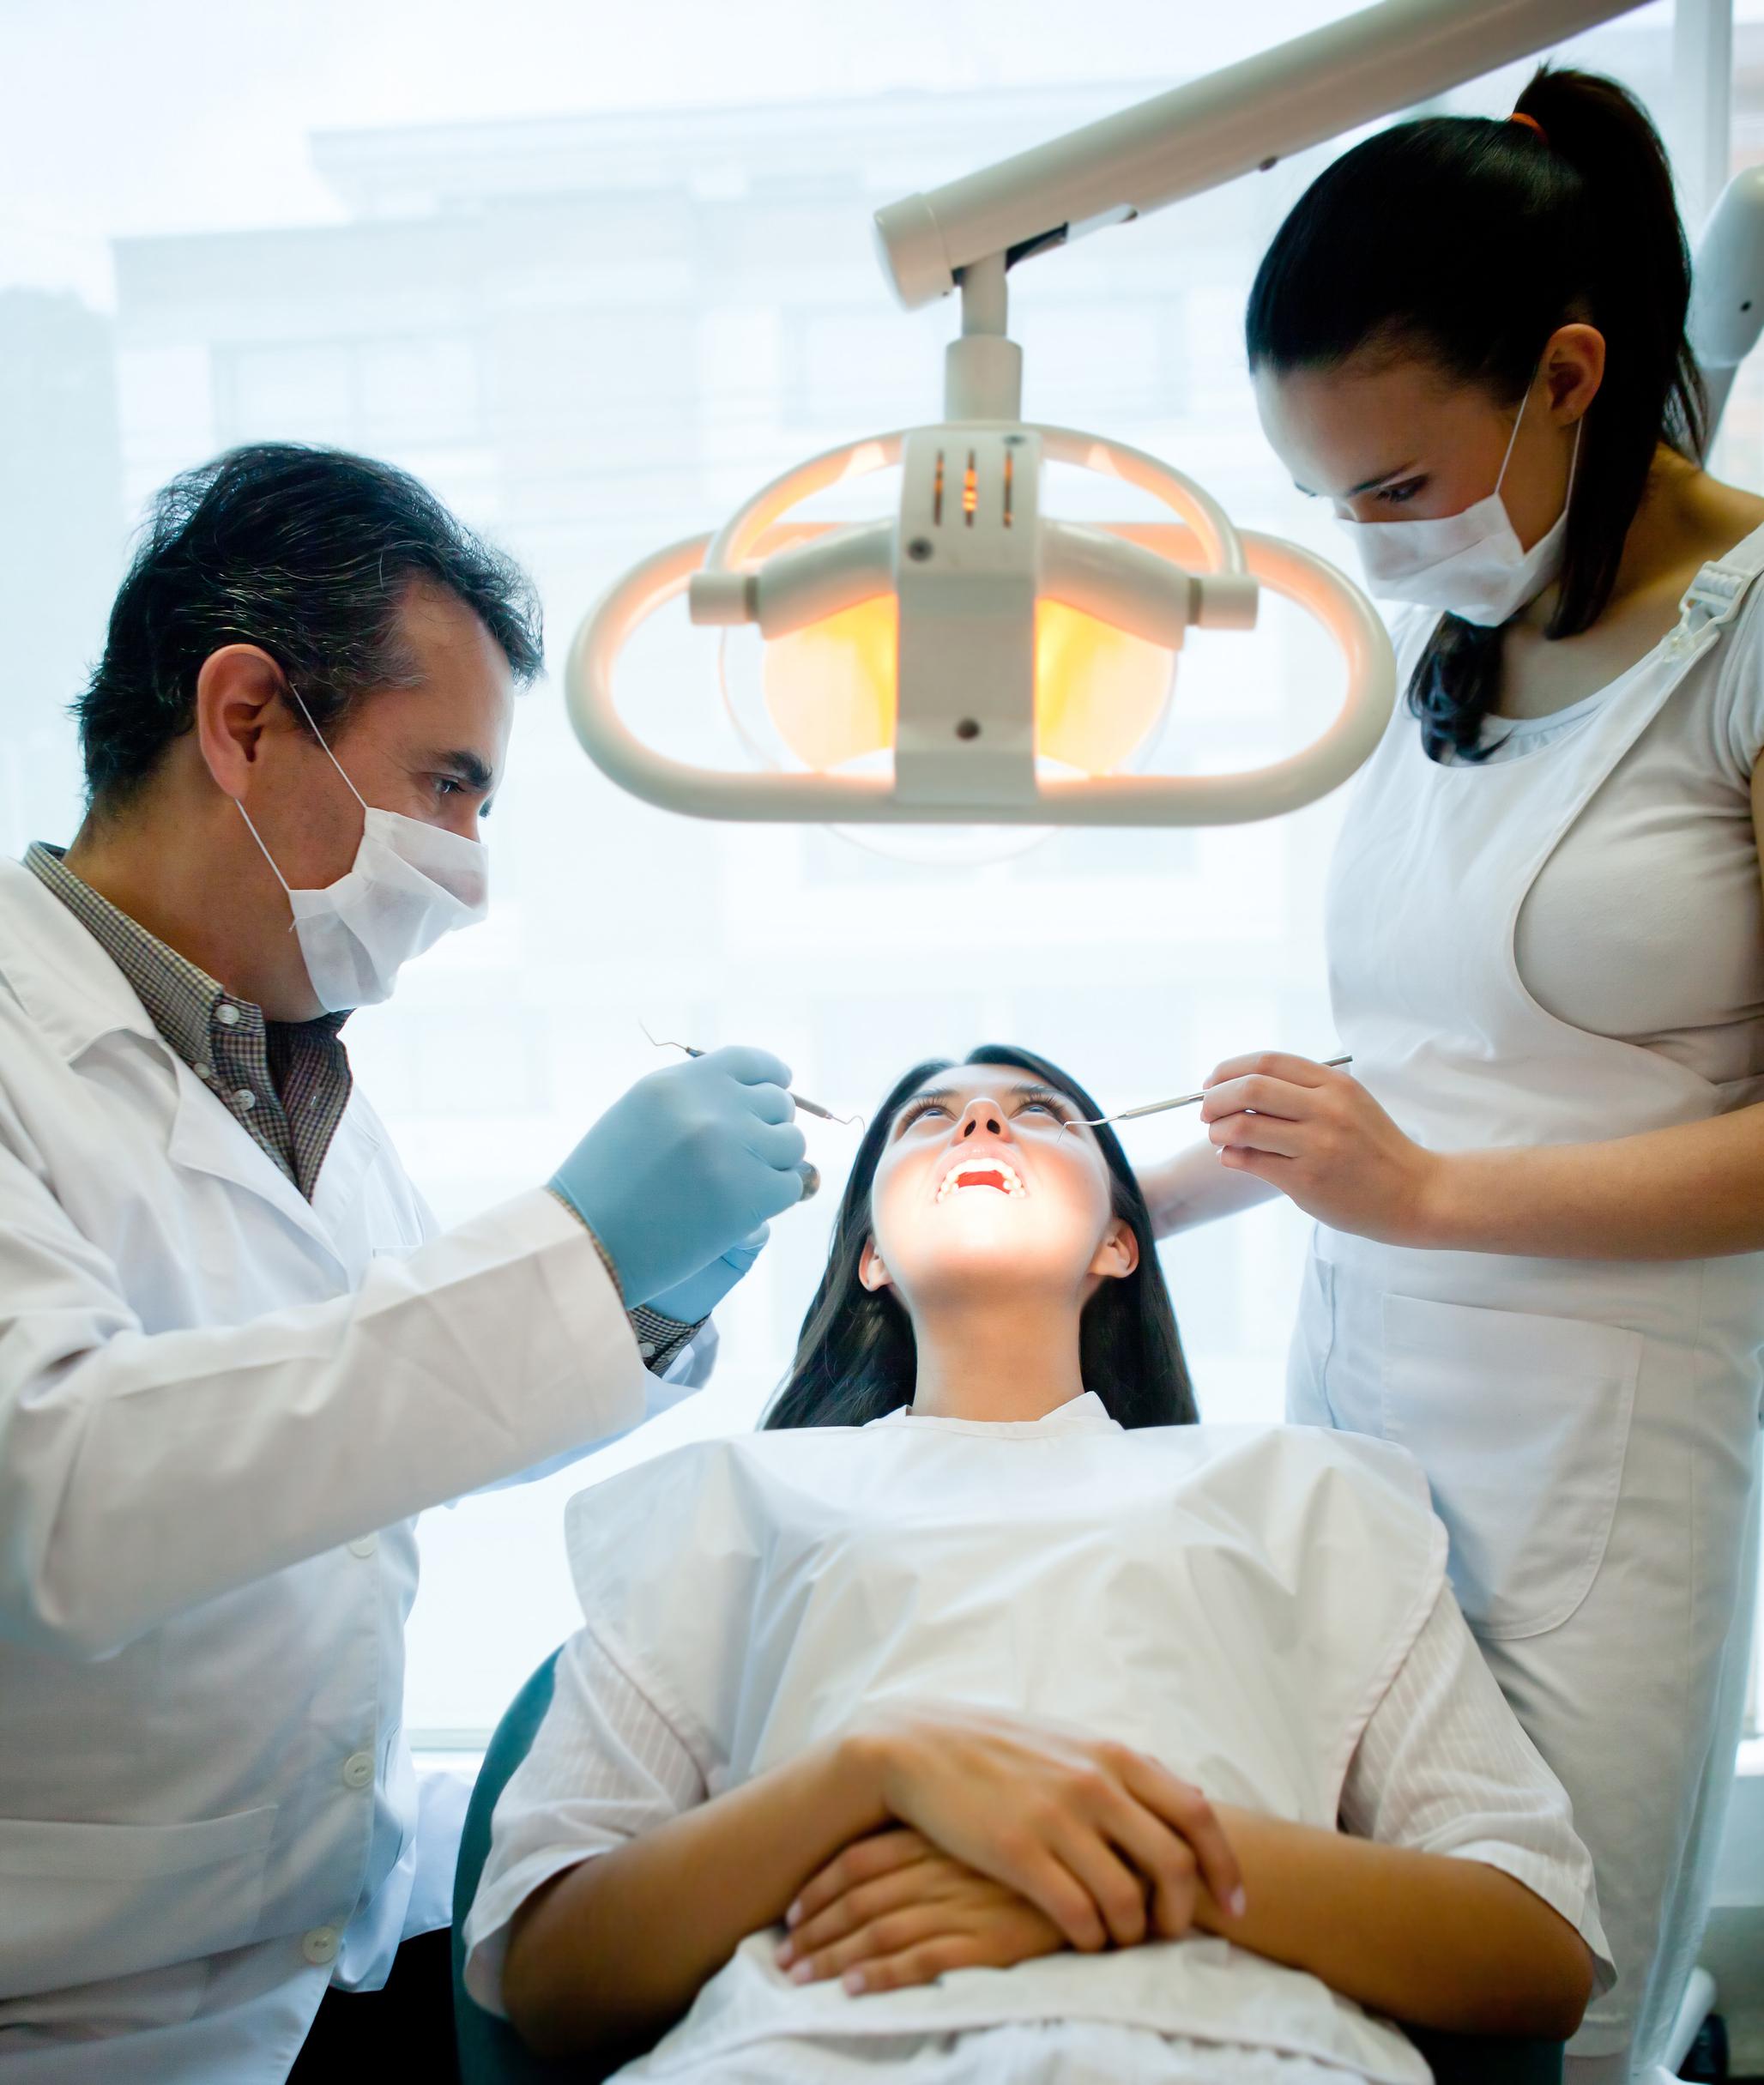 arizona dental assistant attorney